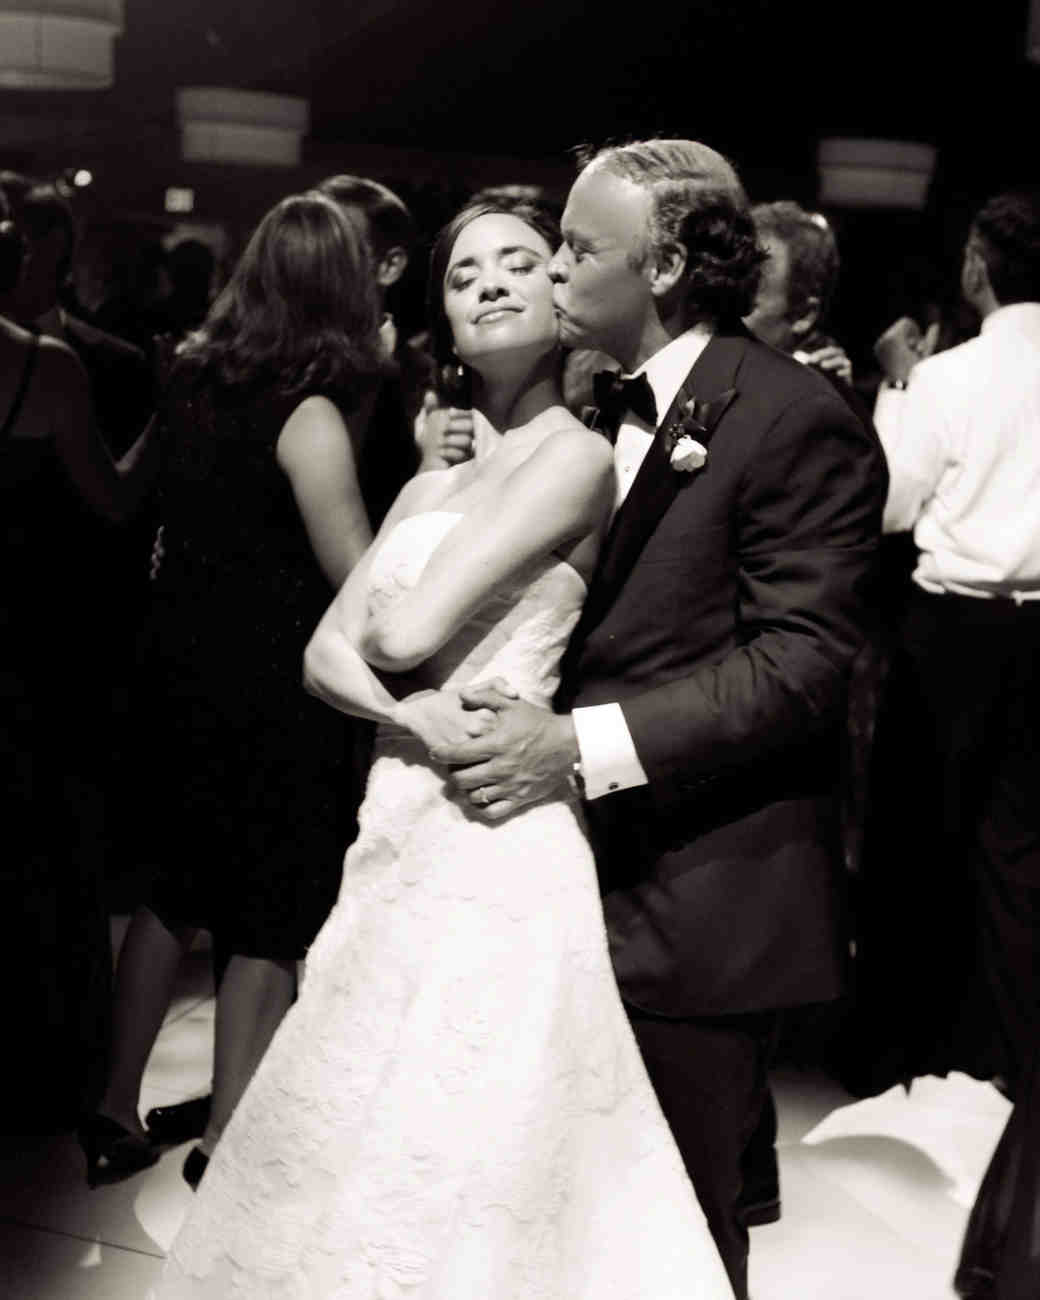 sally-mark-wedding-father-daughter-0414.jpg